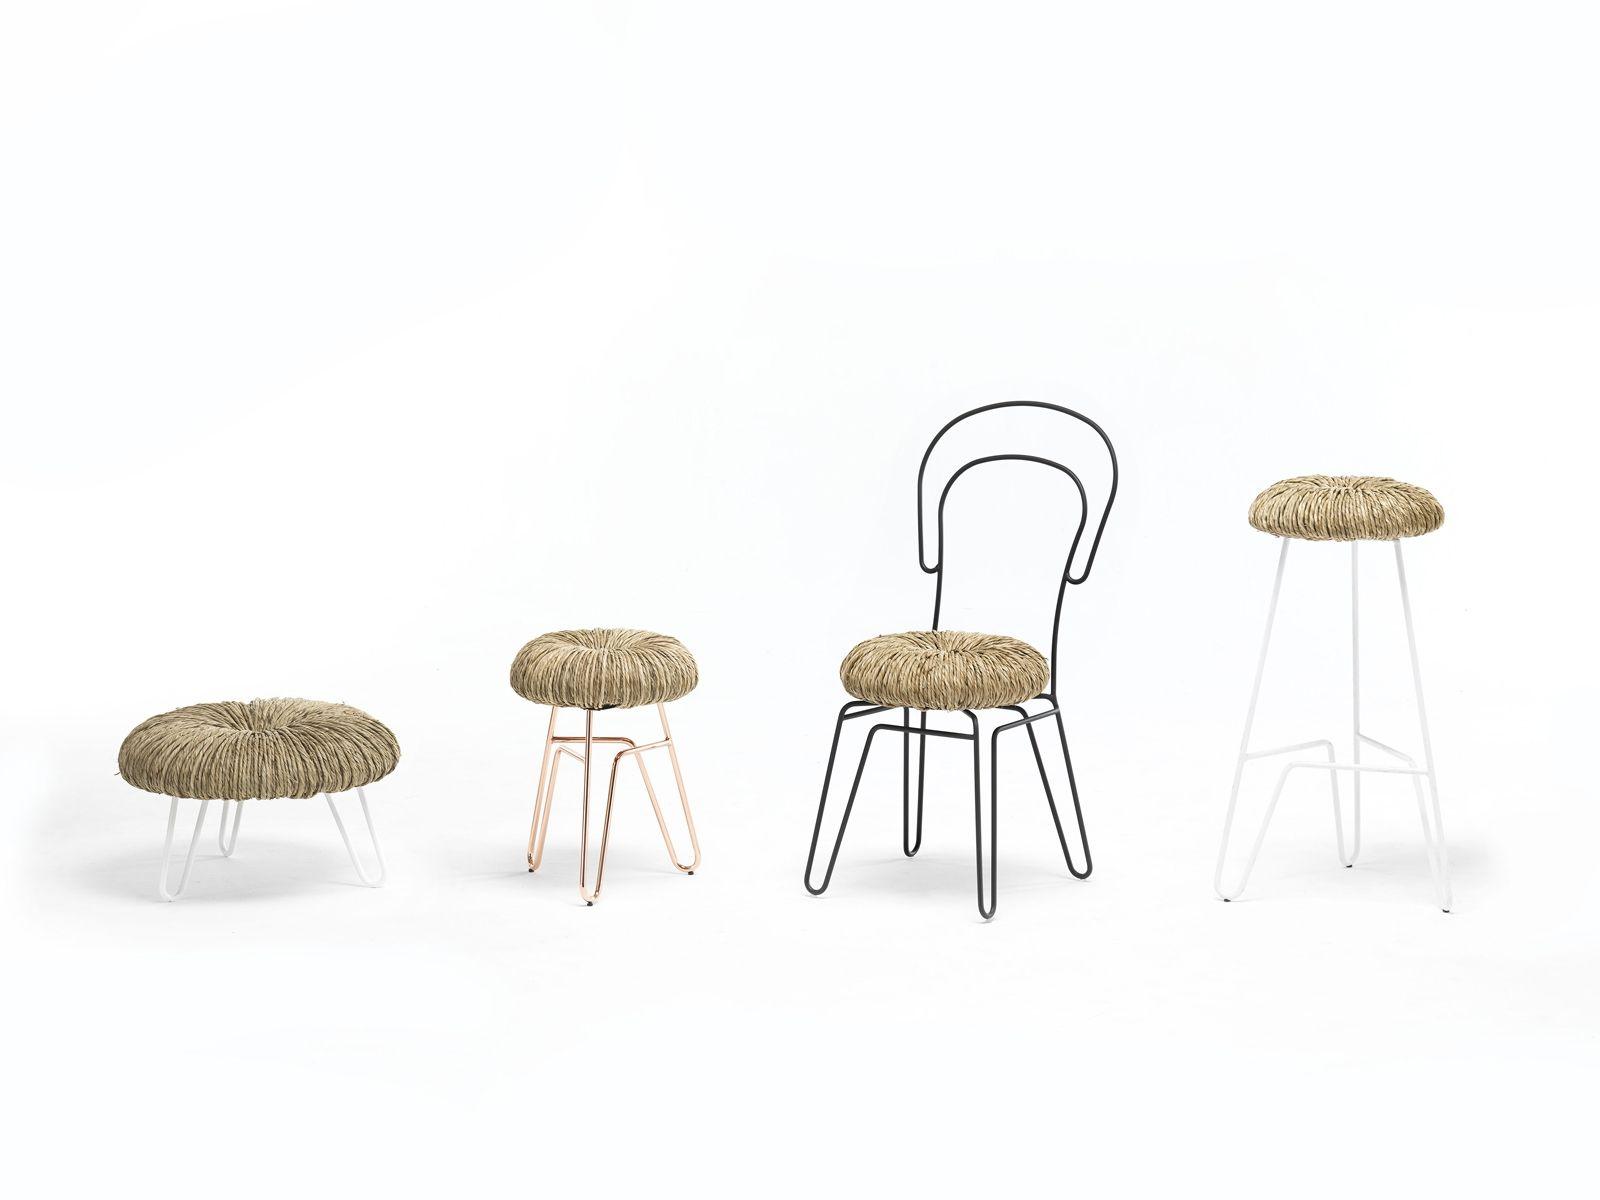 Sedie Alte Da Bar Design donut / alessandra baldereschi, 2014 /sgabello. stool / http